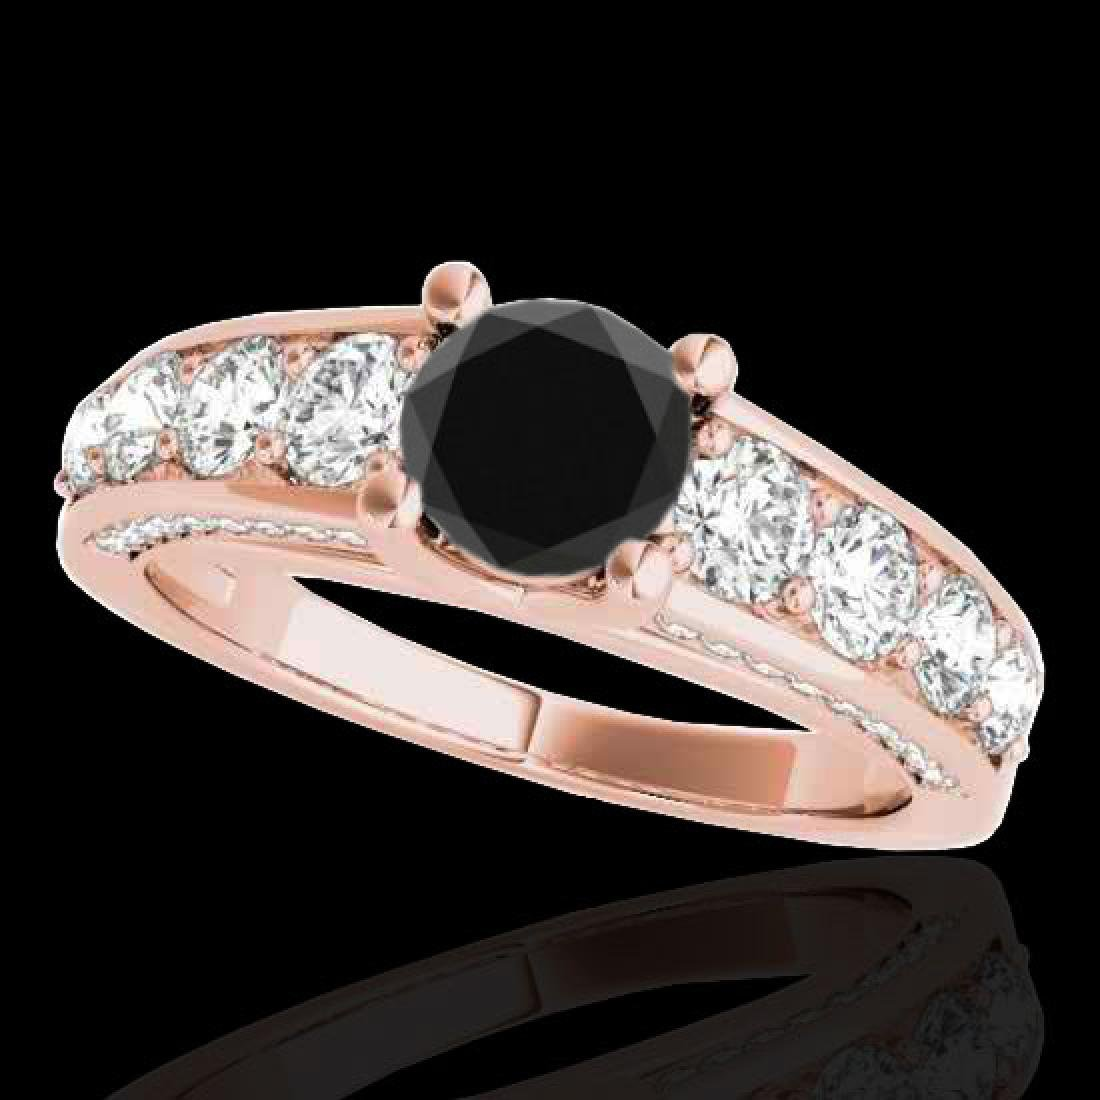 3.05 CTW Certified VS Black Diamond Solitaire Ring 10K